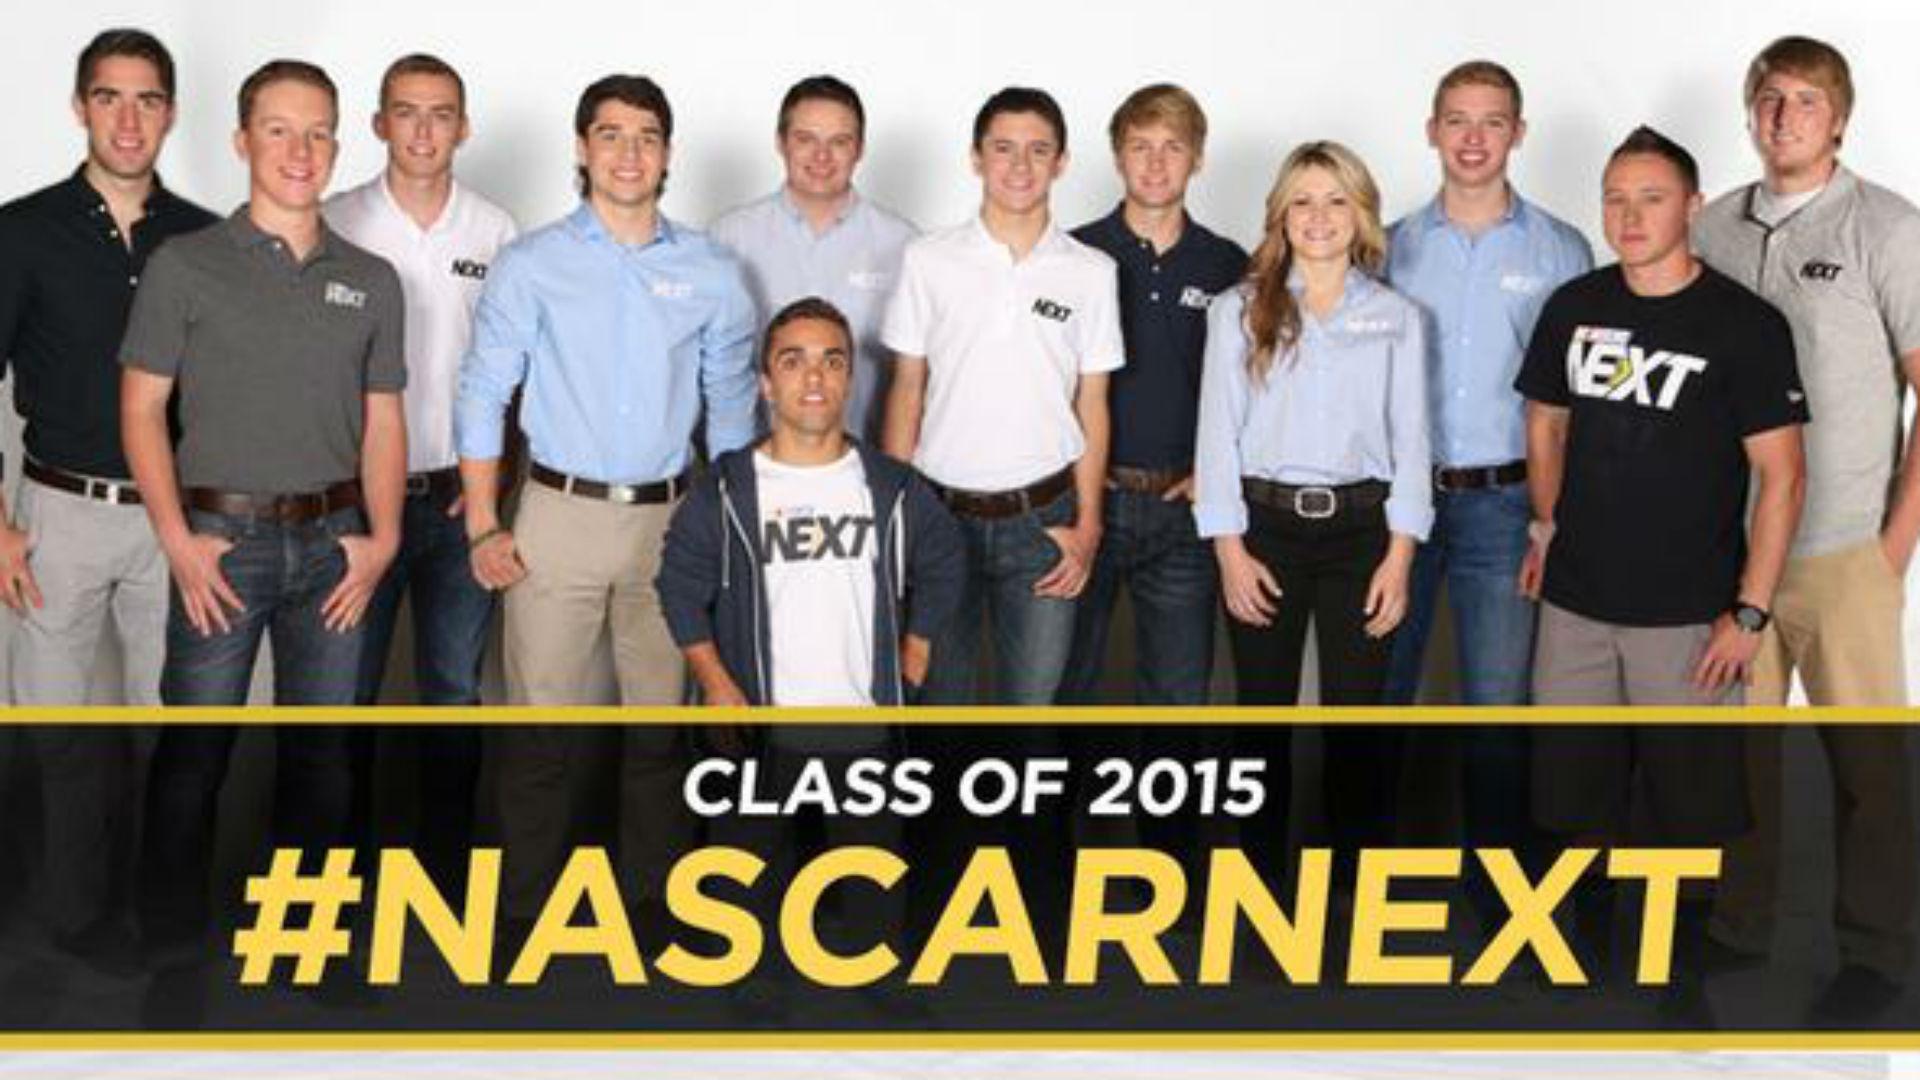 NASCAR announces 2015 Next class